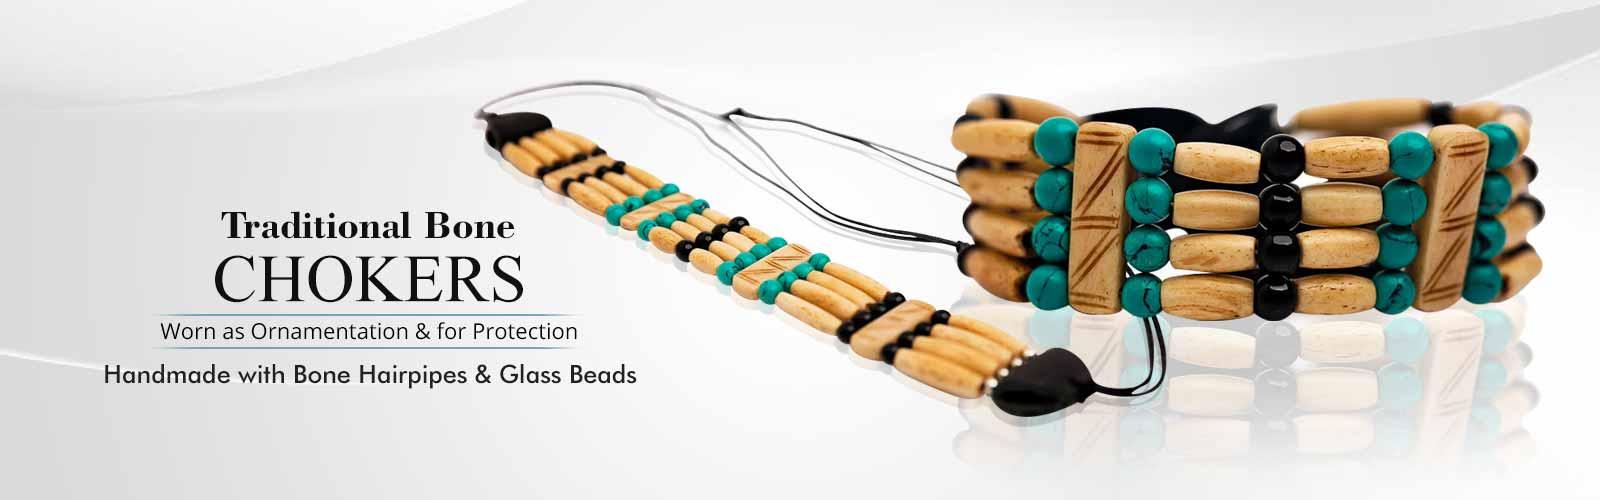 Traditional Bone Chokers